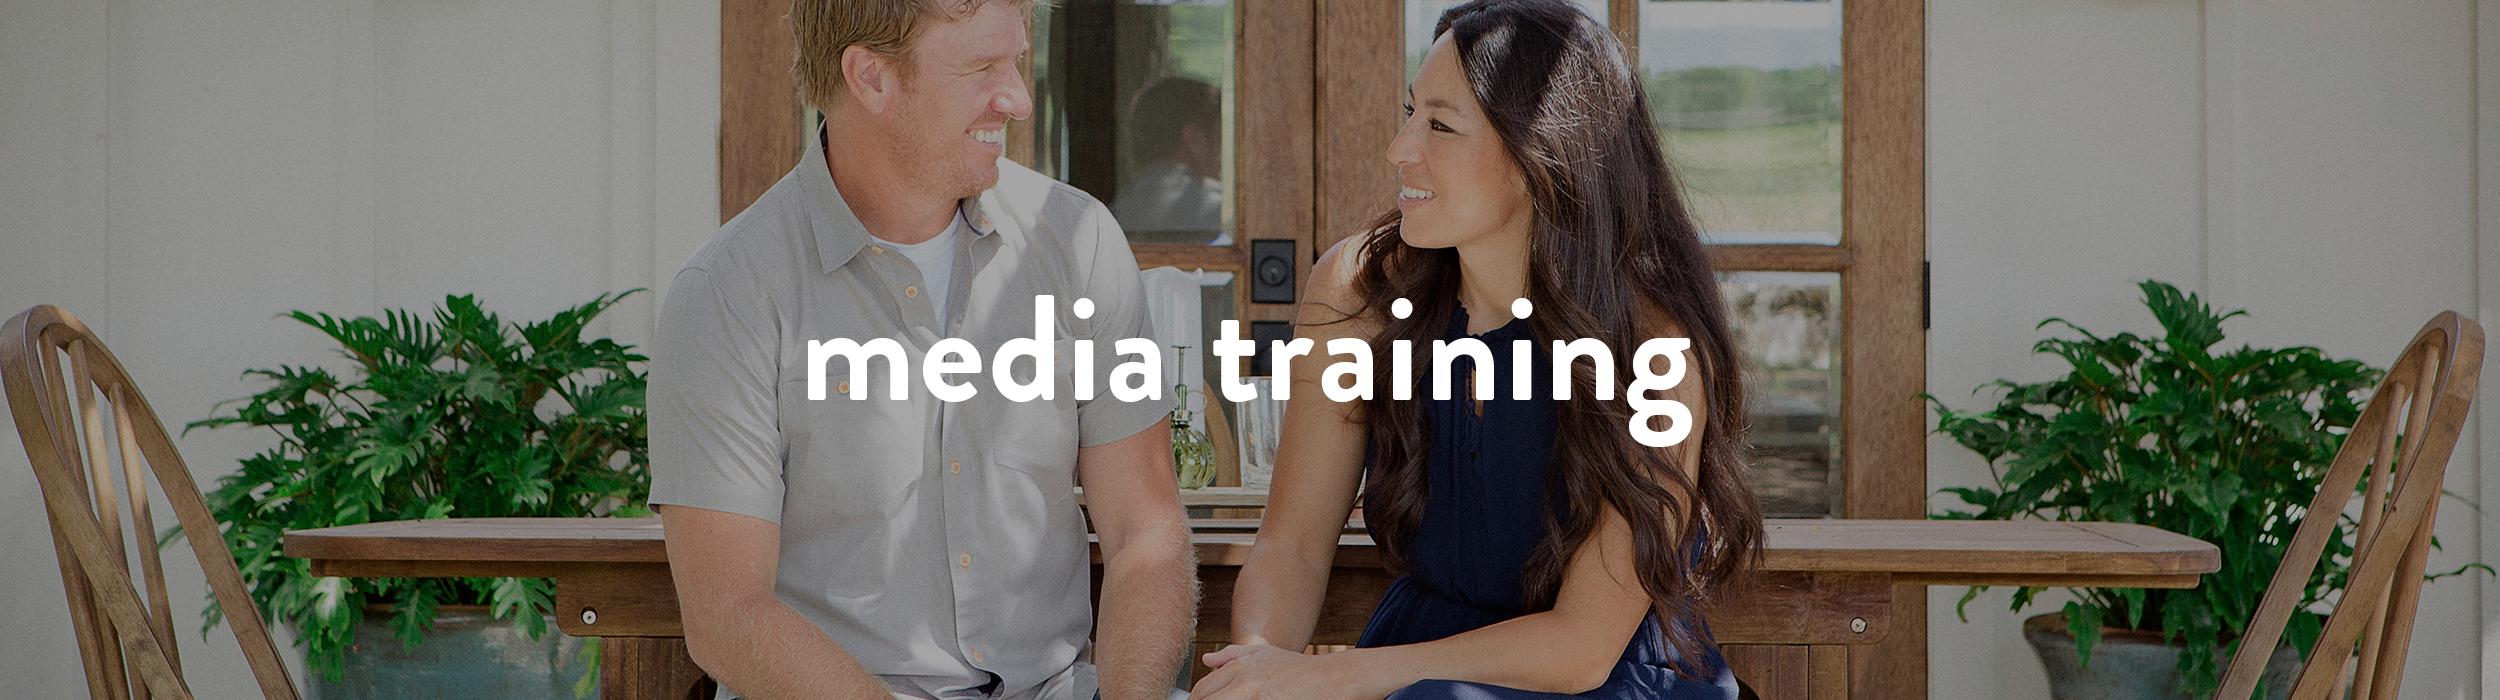 media training.png